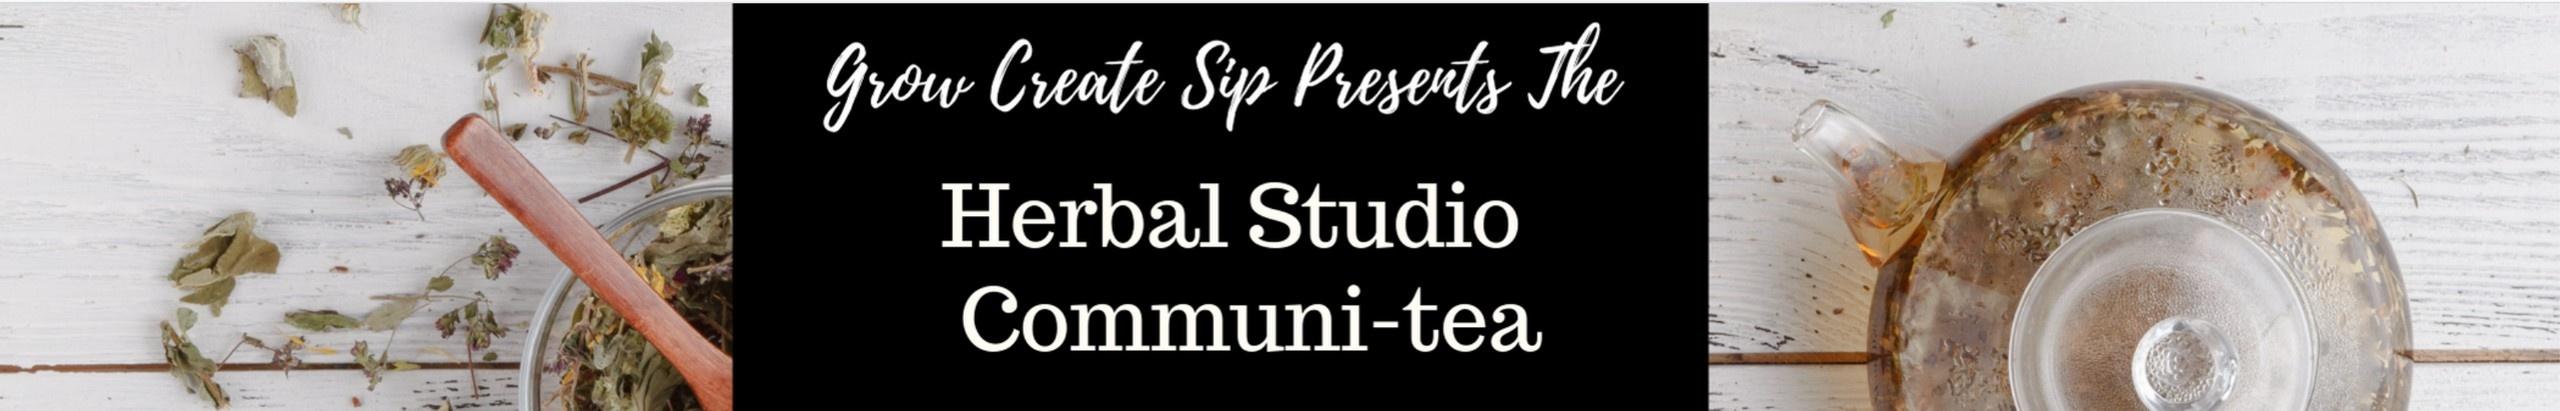 Herbal Studio Communi-tea